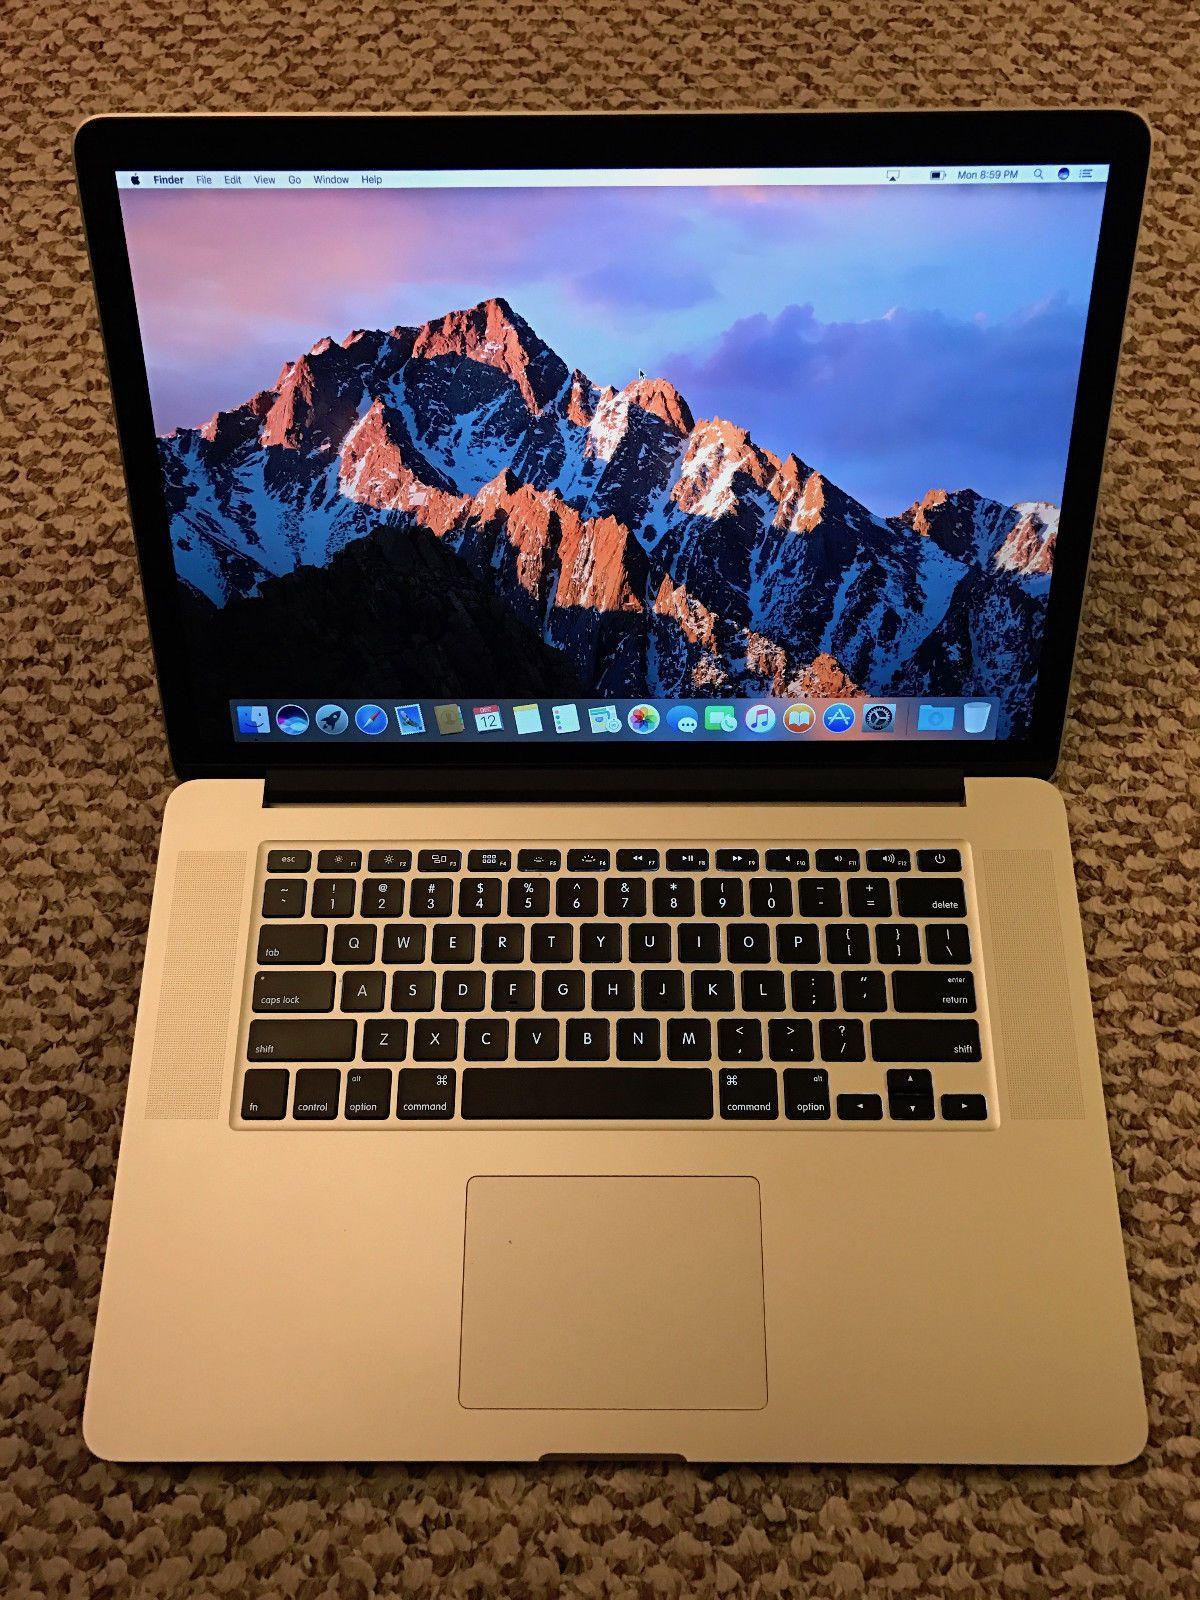 Apple RETINA Macbook Pro 15in late 2013 Applecare 2017